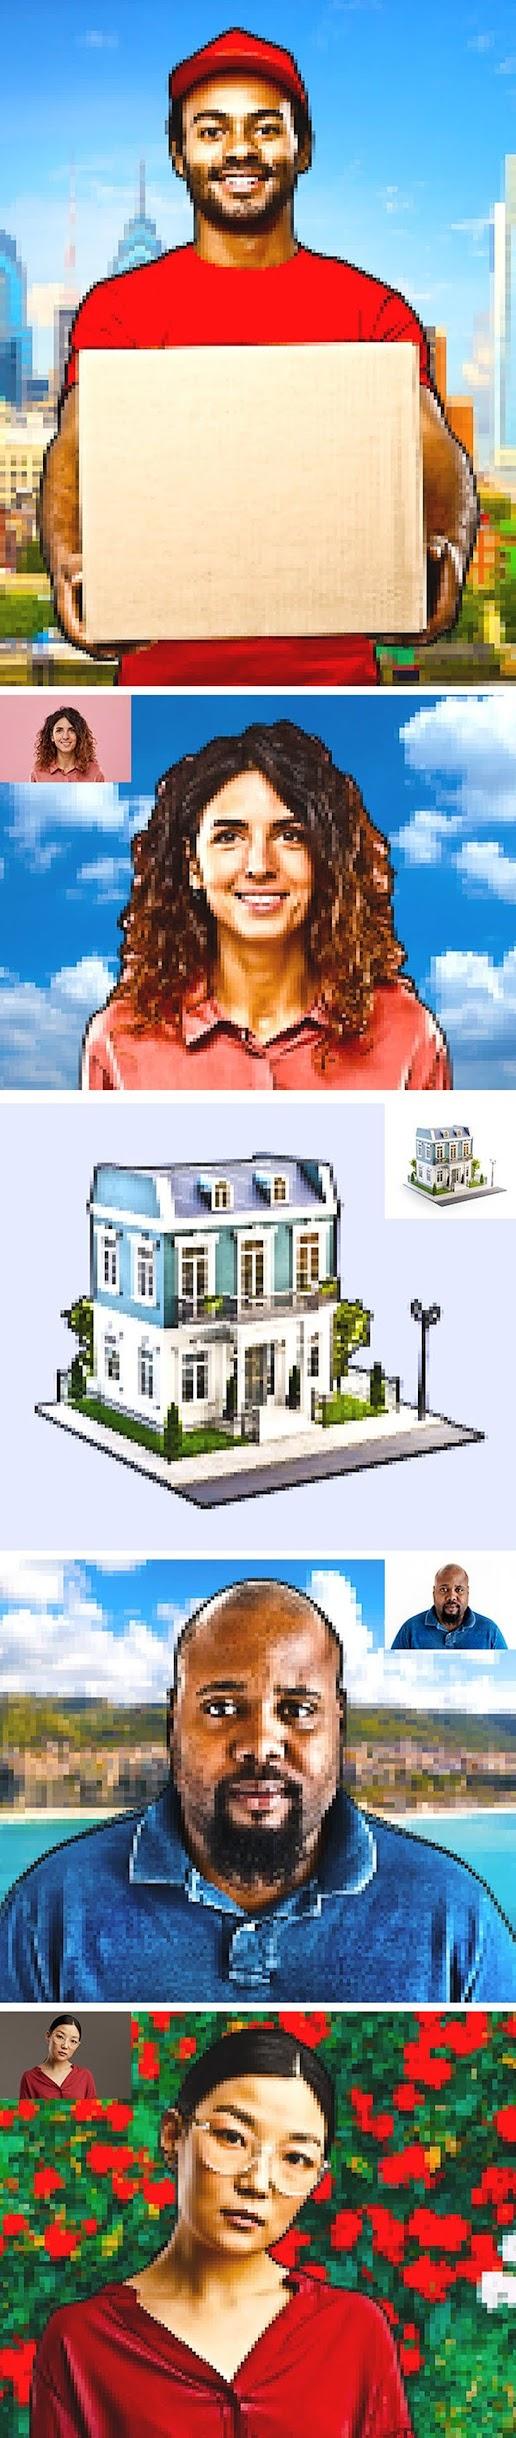 8 Bit Pixel Art Photoshop Action 27617633 Free